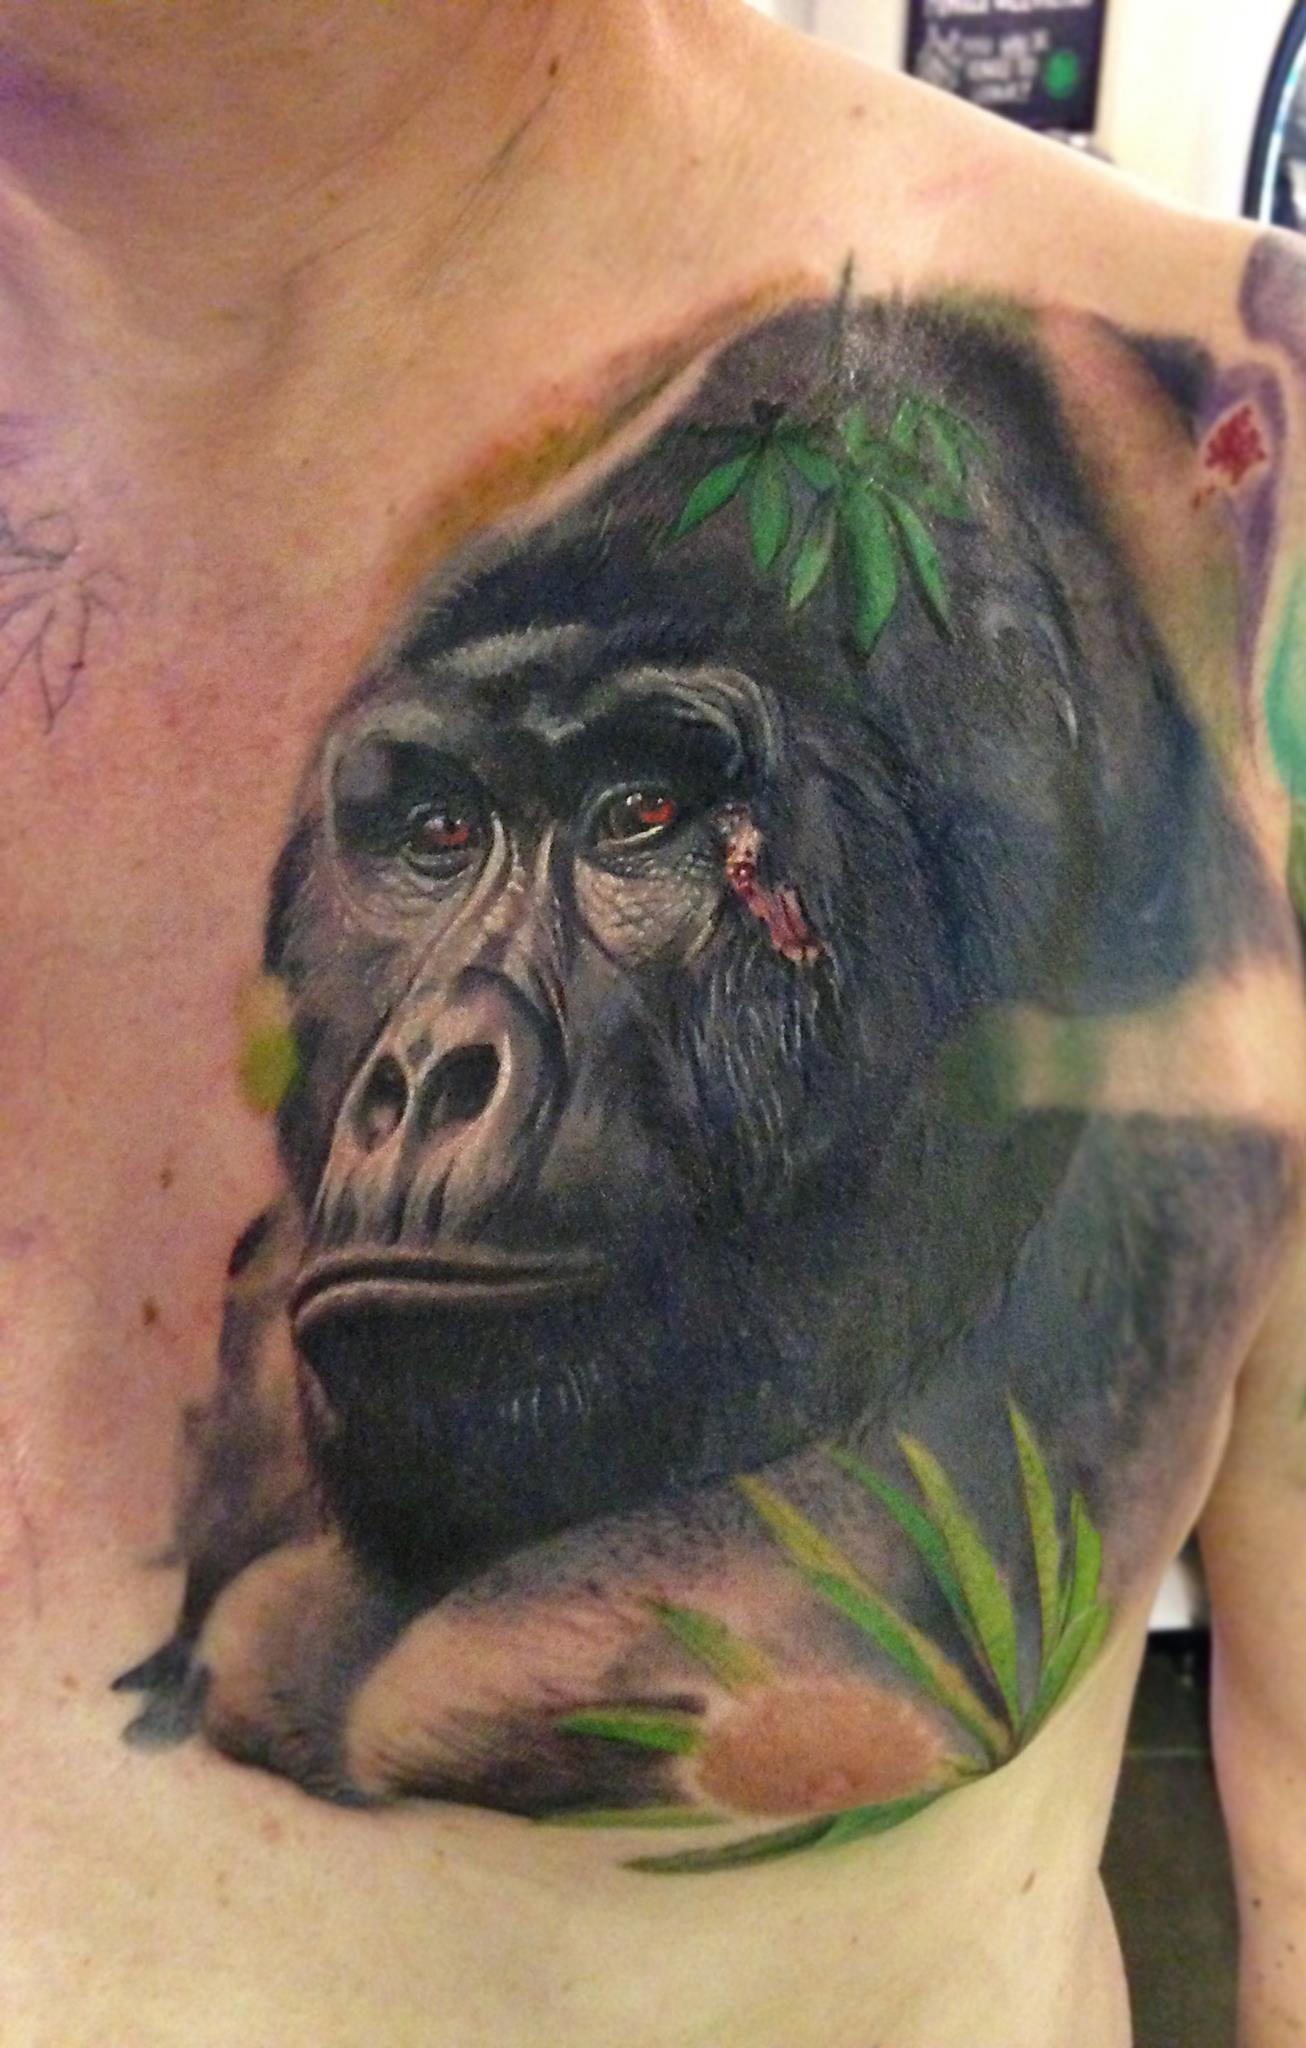 Maui Meherzi - Opus Magnum Tattoo Studio Wien - Gorilla Tierportrait Tattoo Animal Portrait